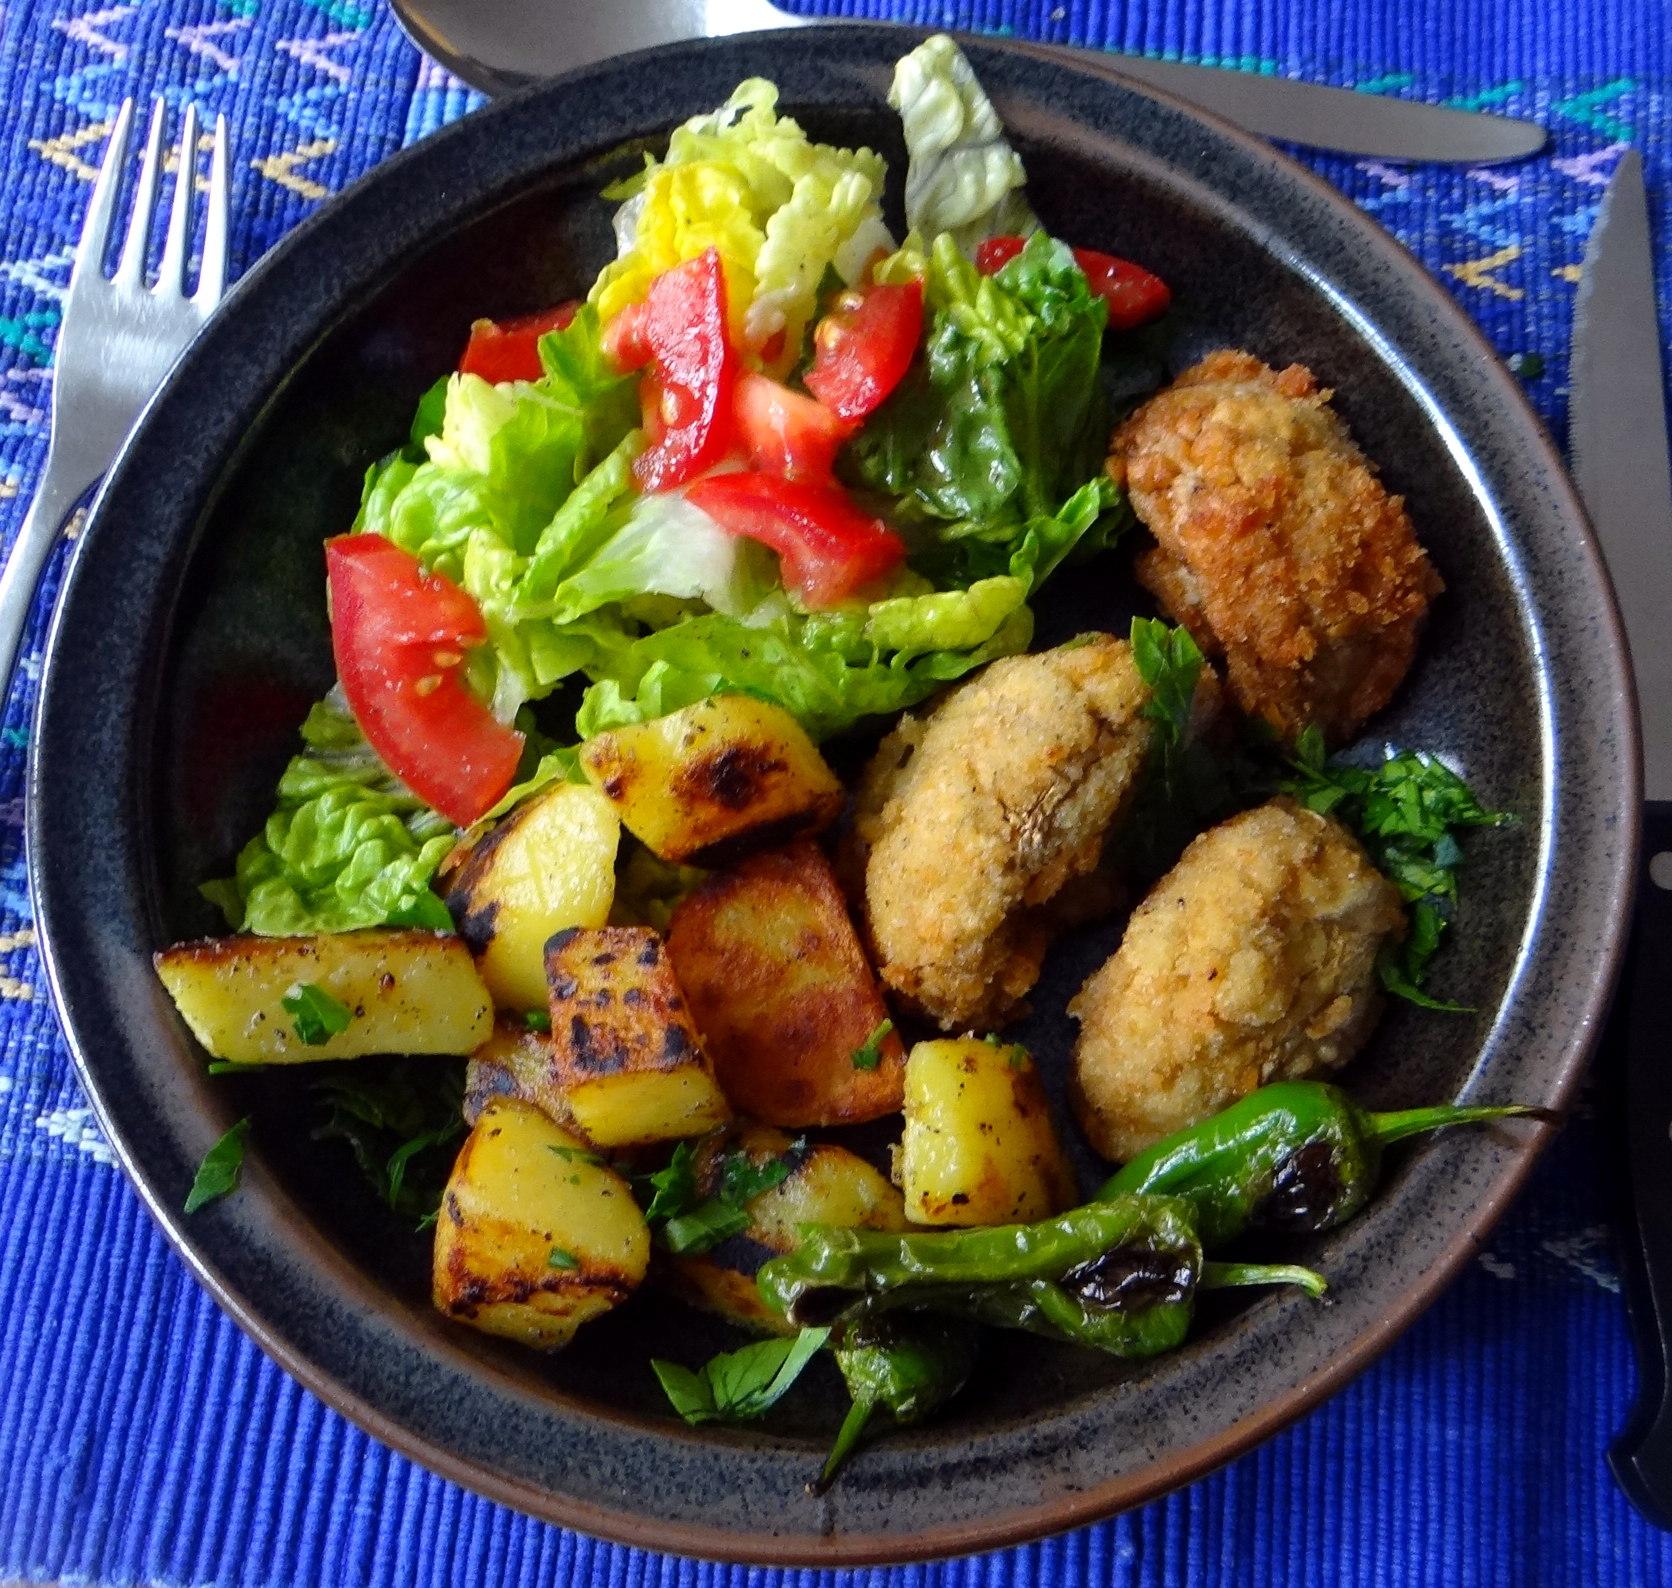 Fritierte Portobello,Bratkartoffeln,Pimientos,Salat,vegan (1)